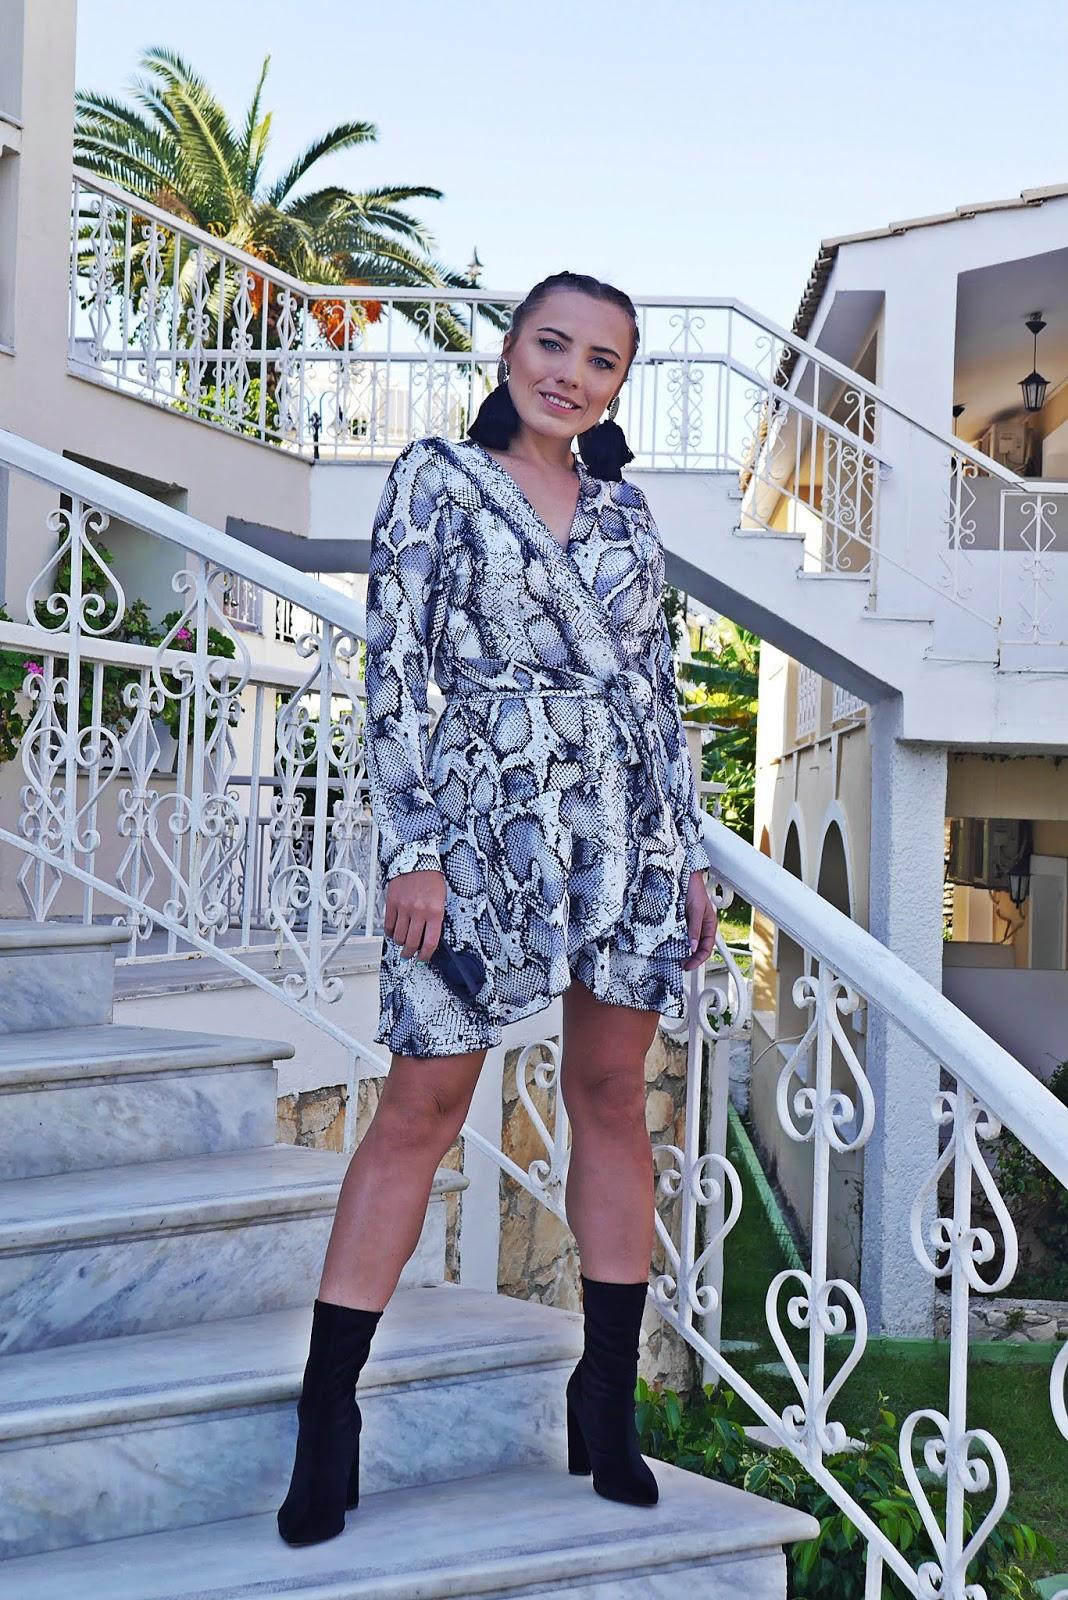 10_pulawy_blog_modowy_blogerka_modowa_karyn_171018